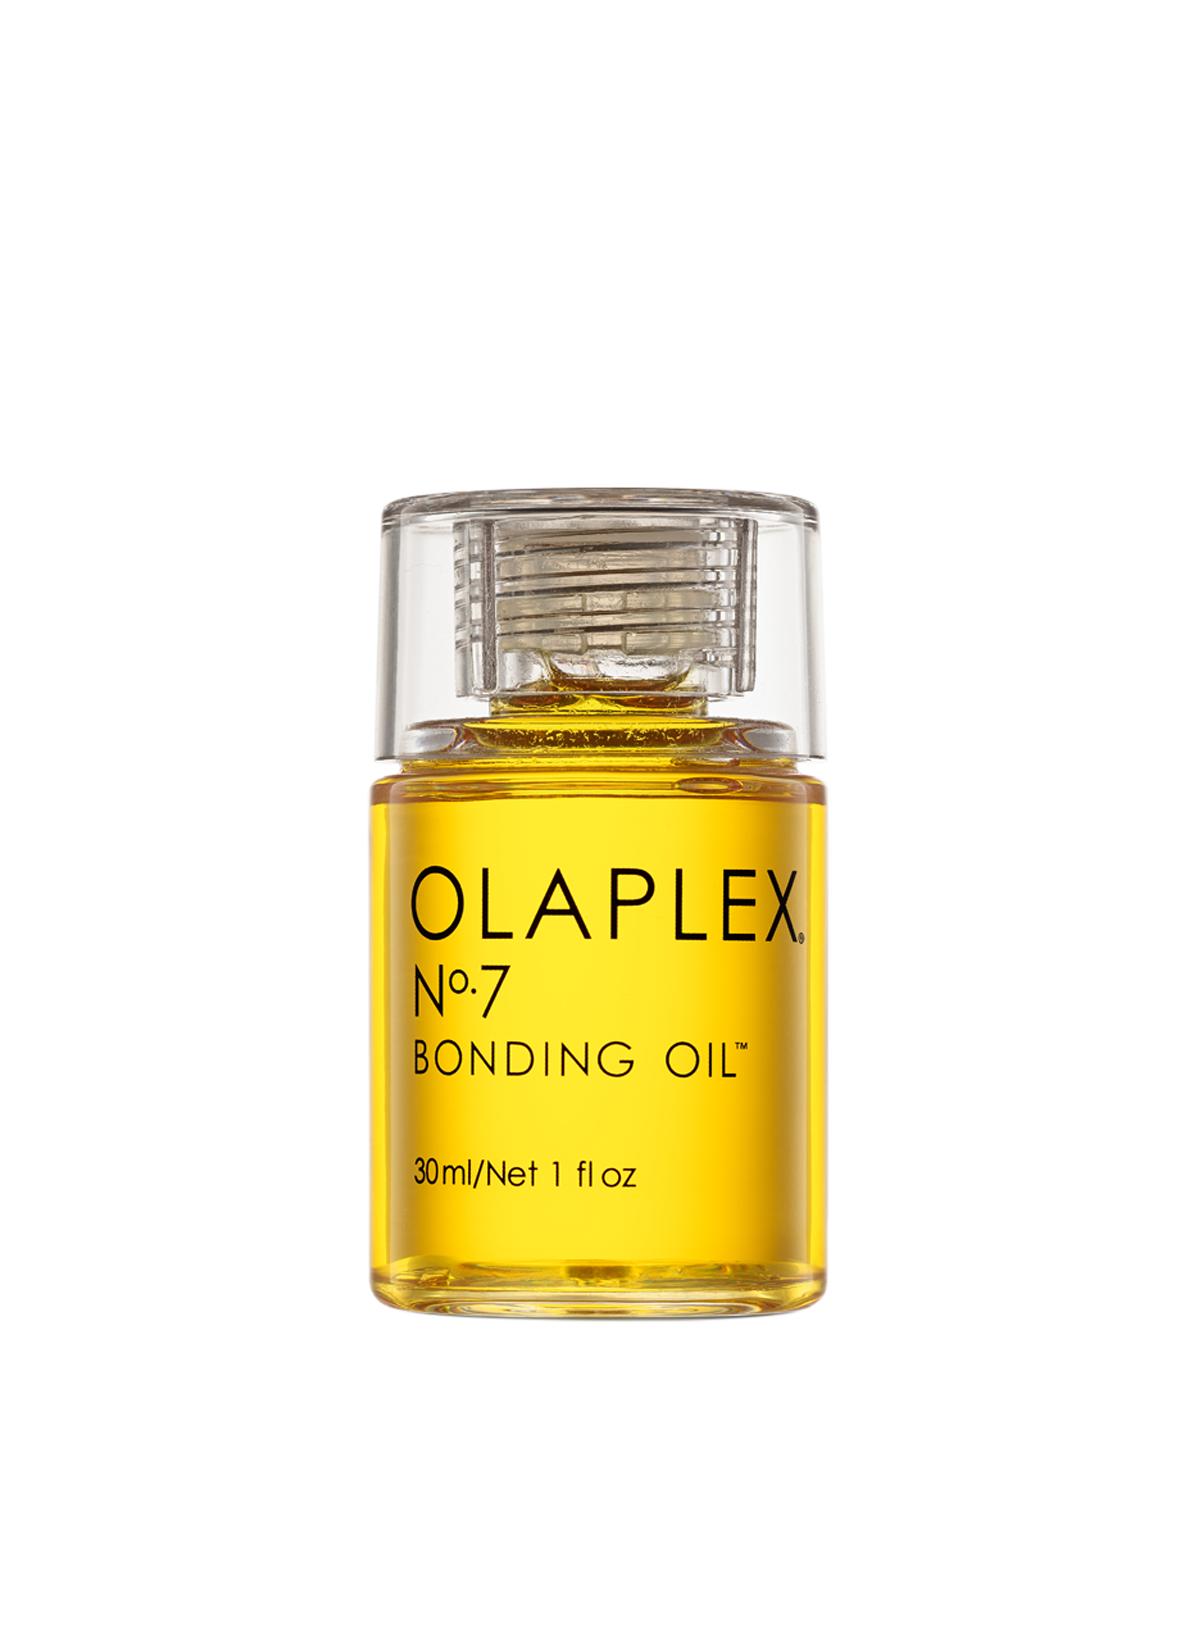 Olaplex Bonding Oil No 7 (30ml)